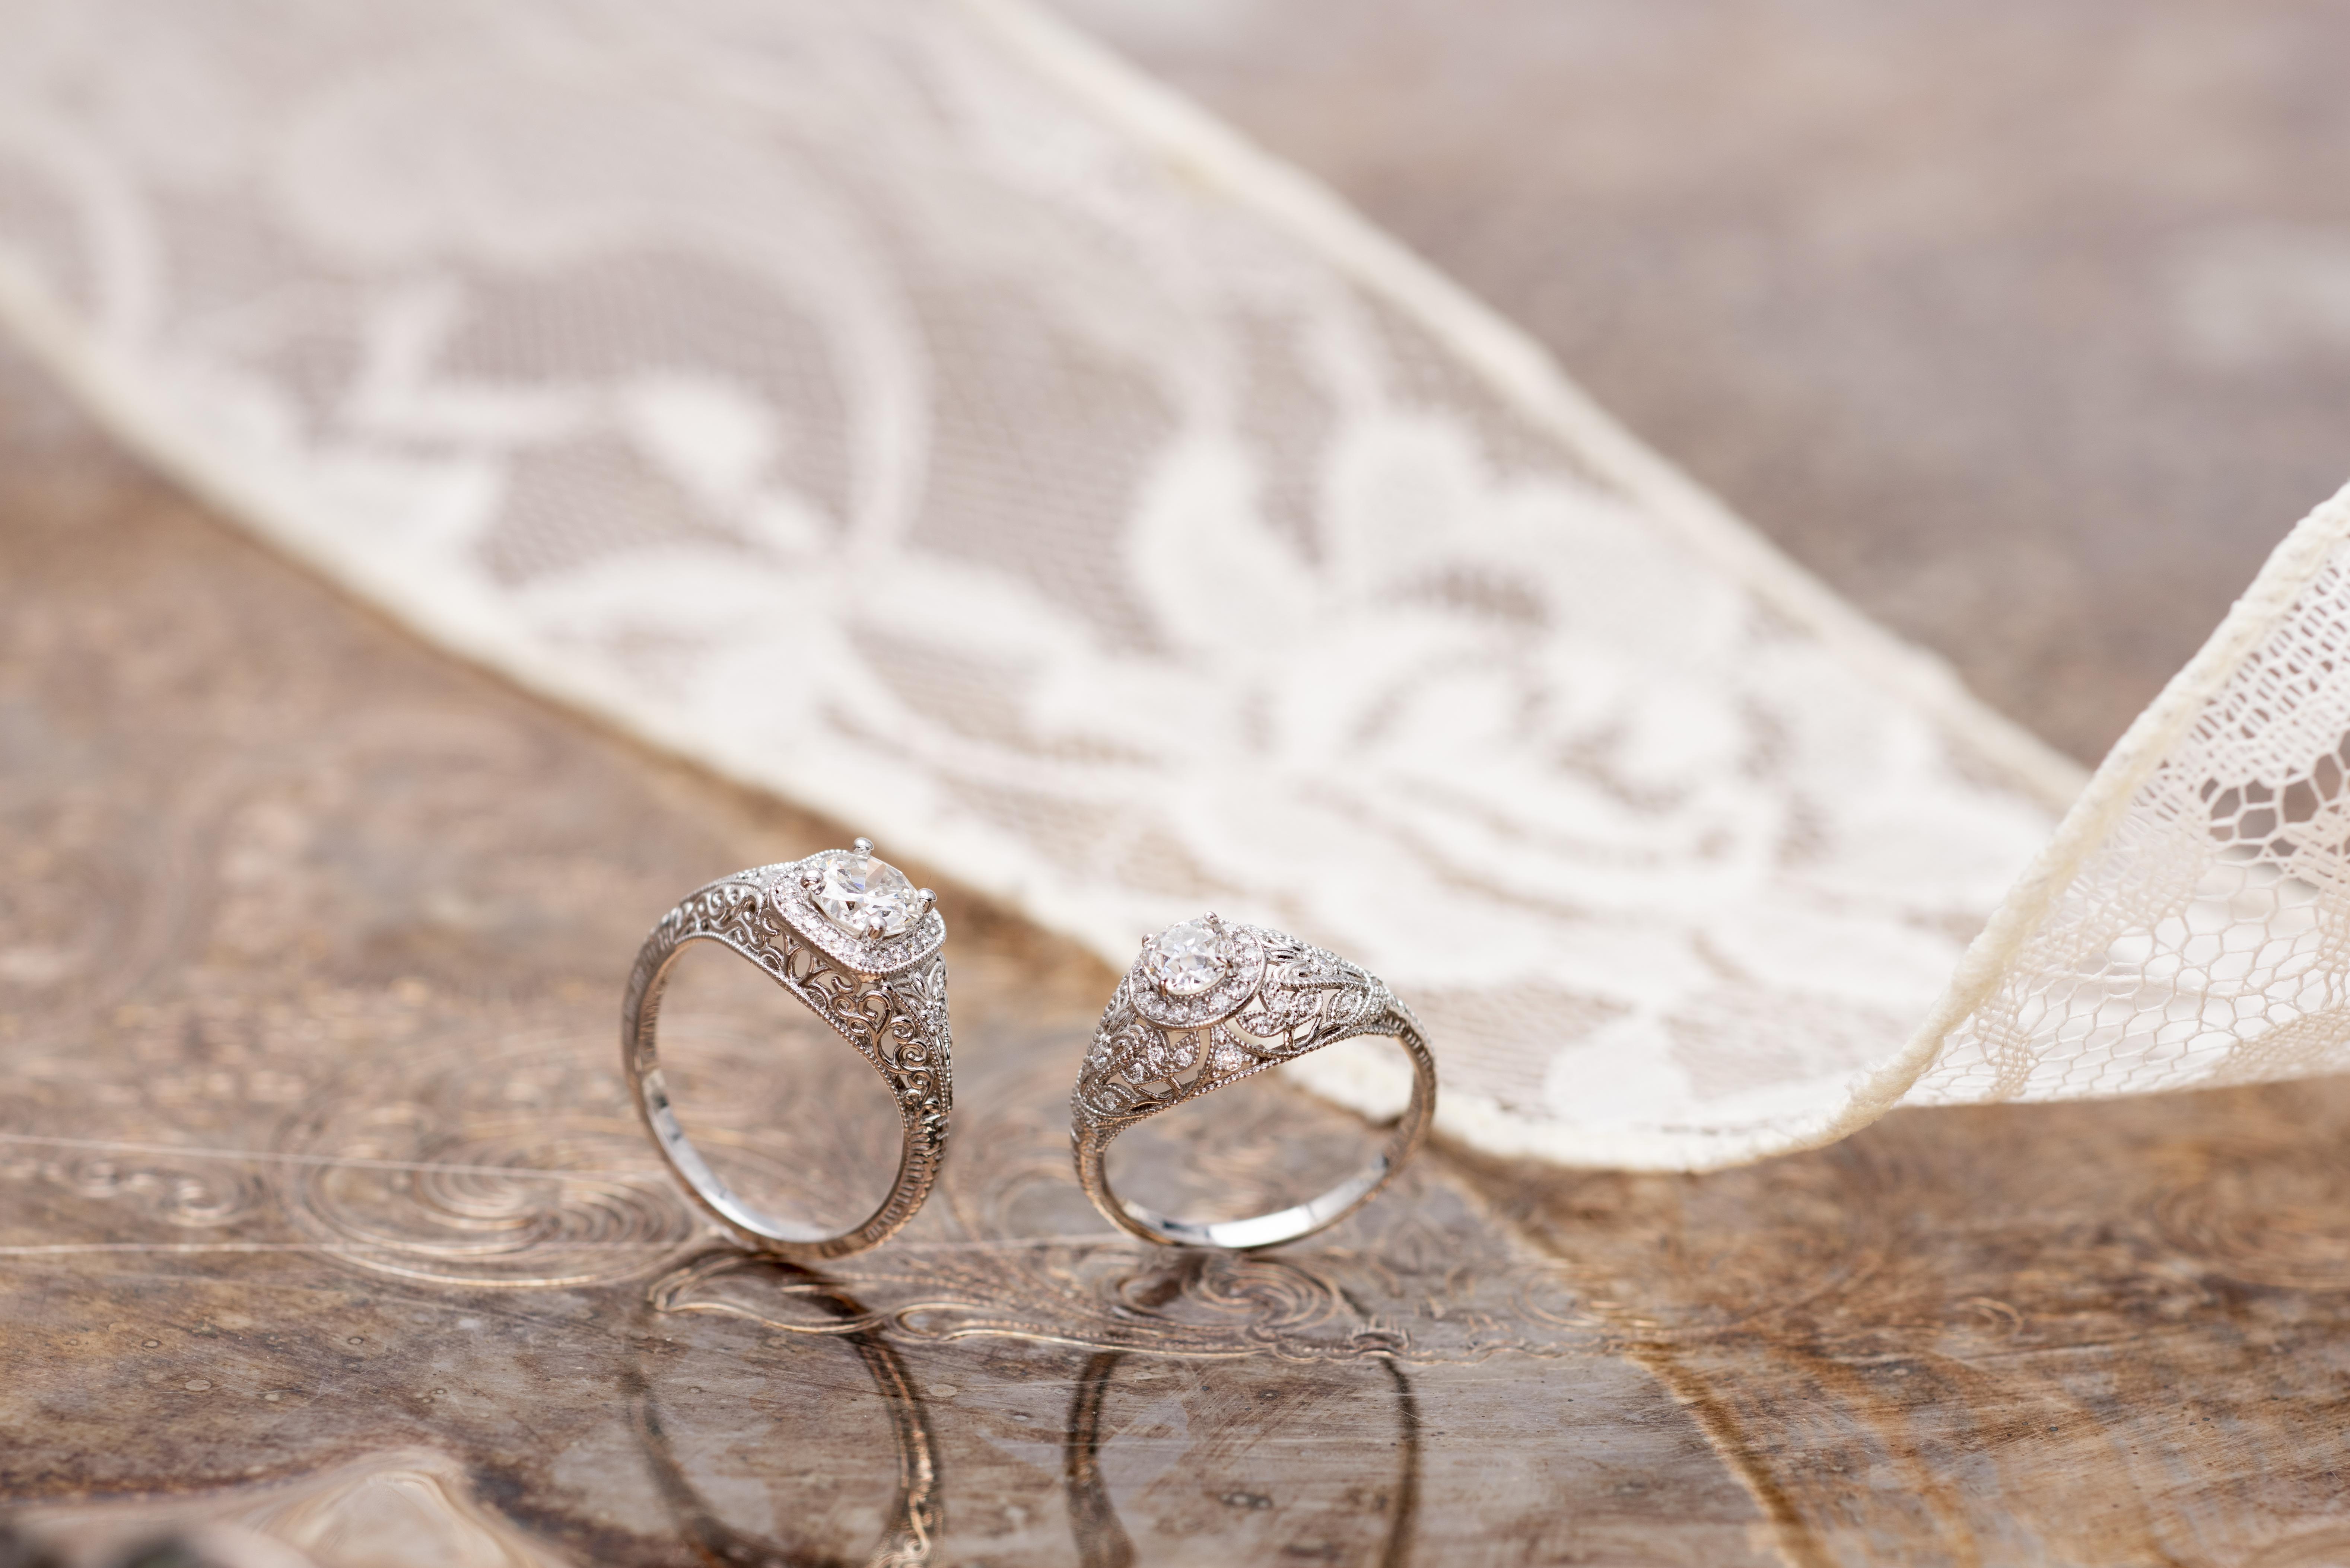 9 Unique Vintage Style Engagement Rings [Feat. Real Vintage Diamonds]